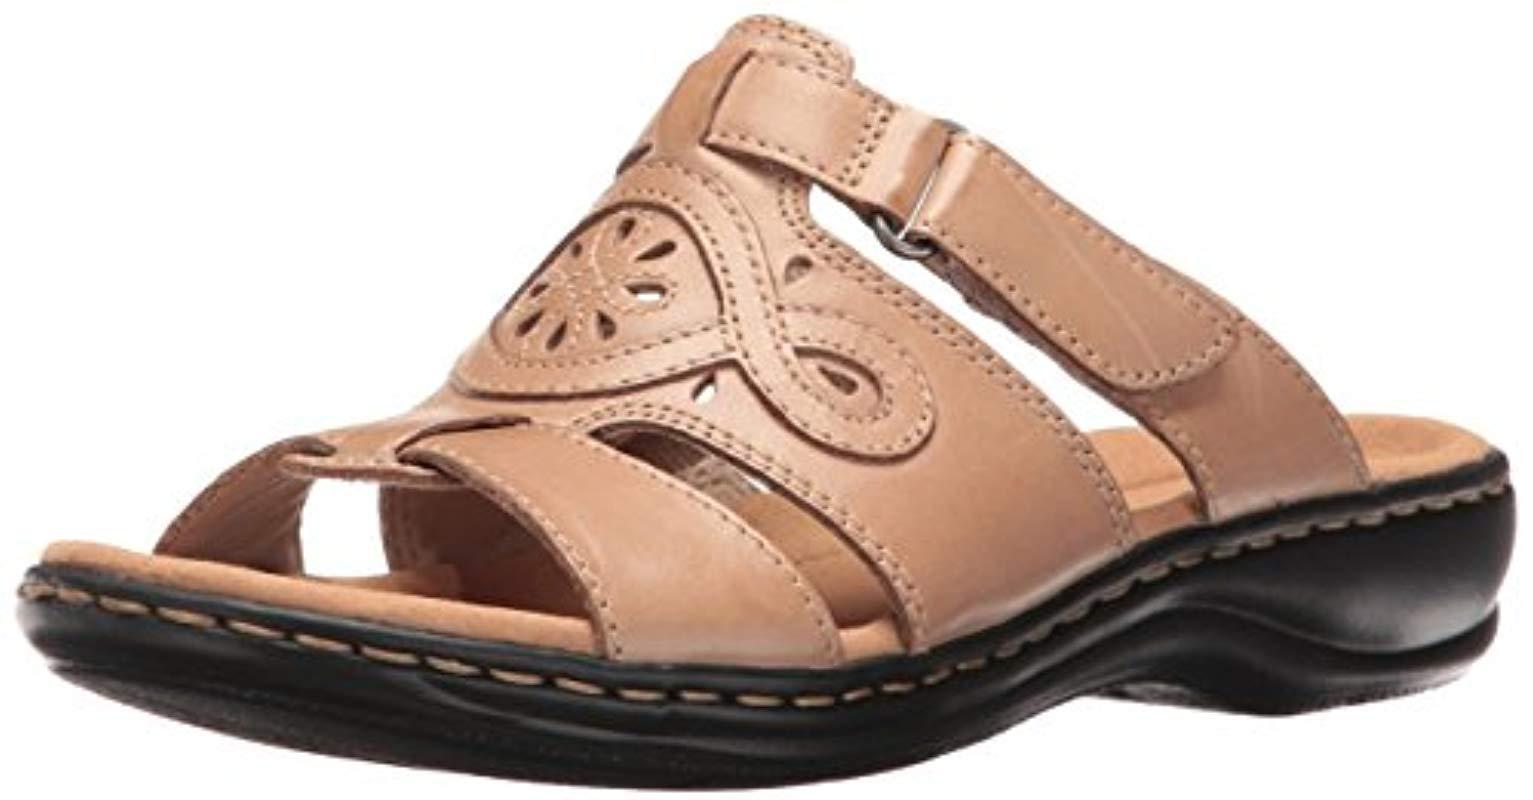 973f427b13f Lyst - Clarks Leisa Higley Slide Sandal - Save 81%